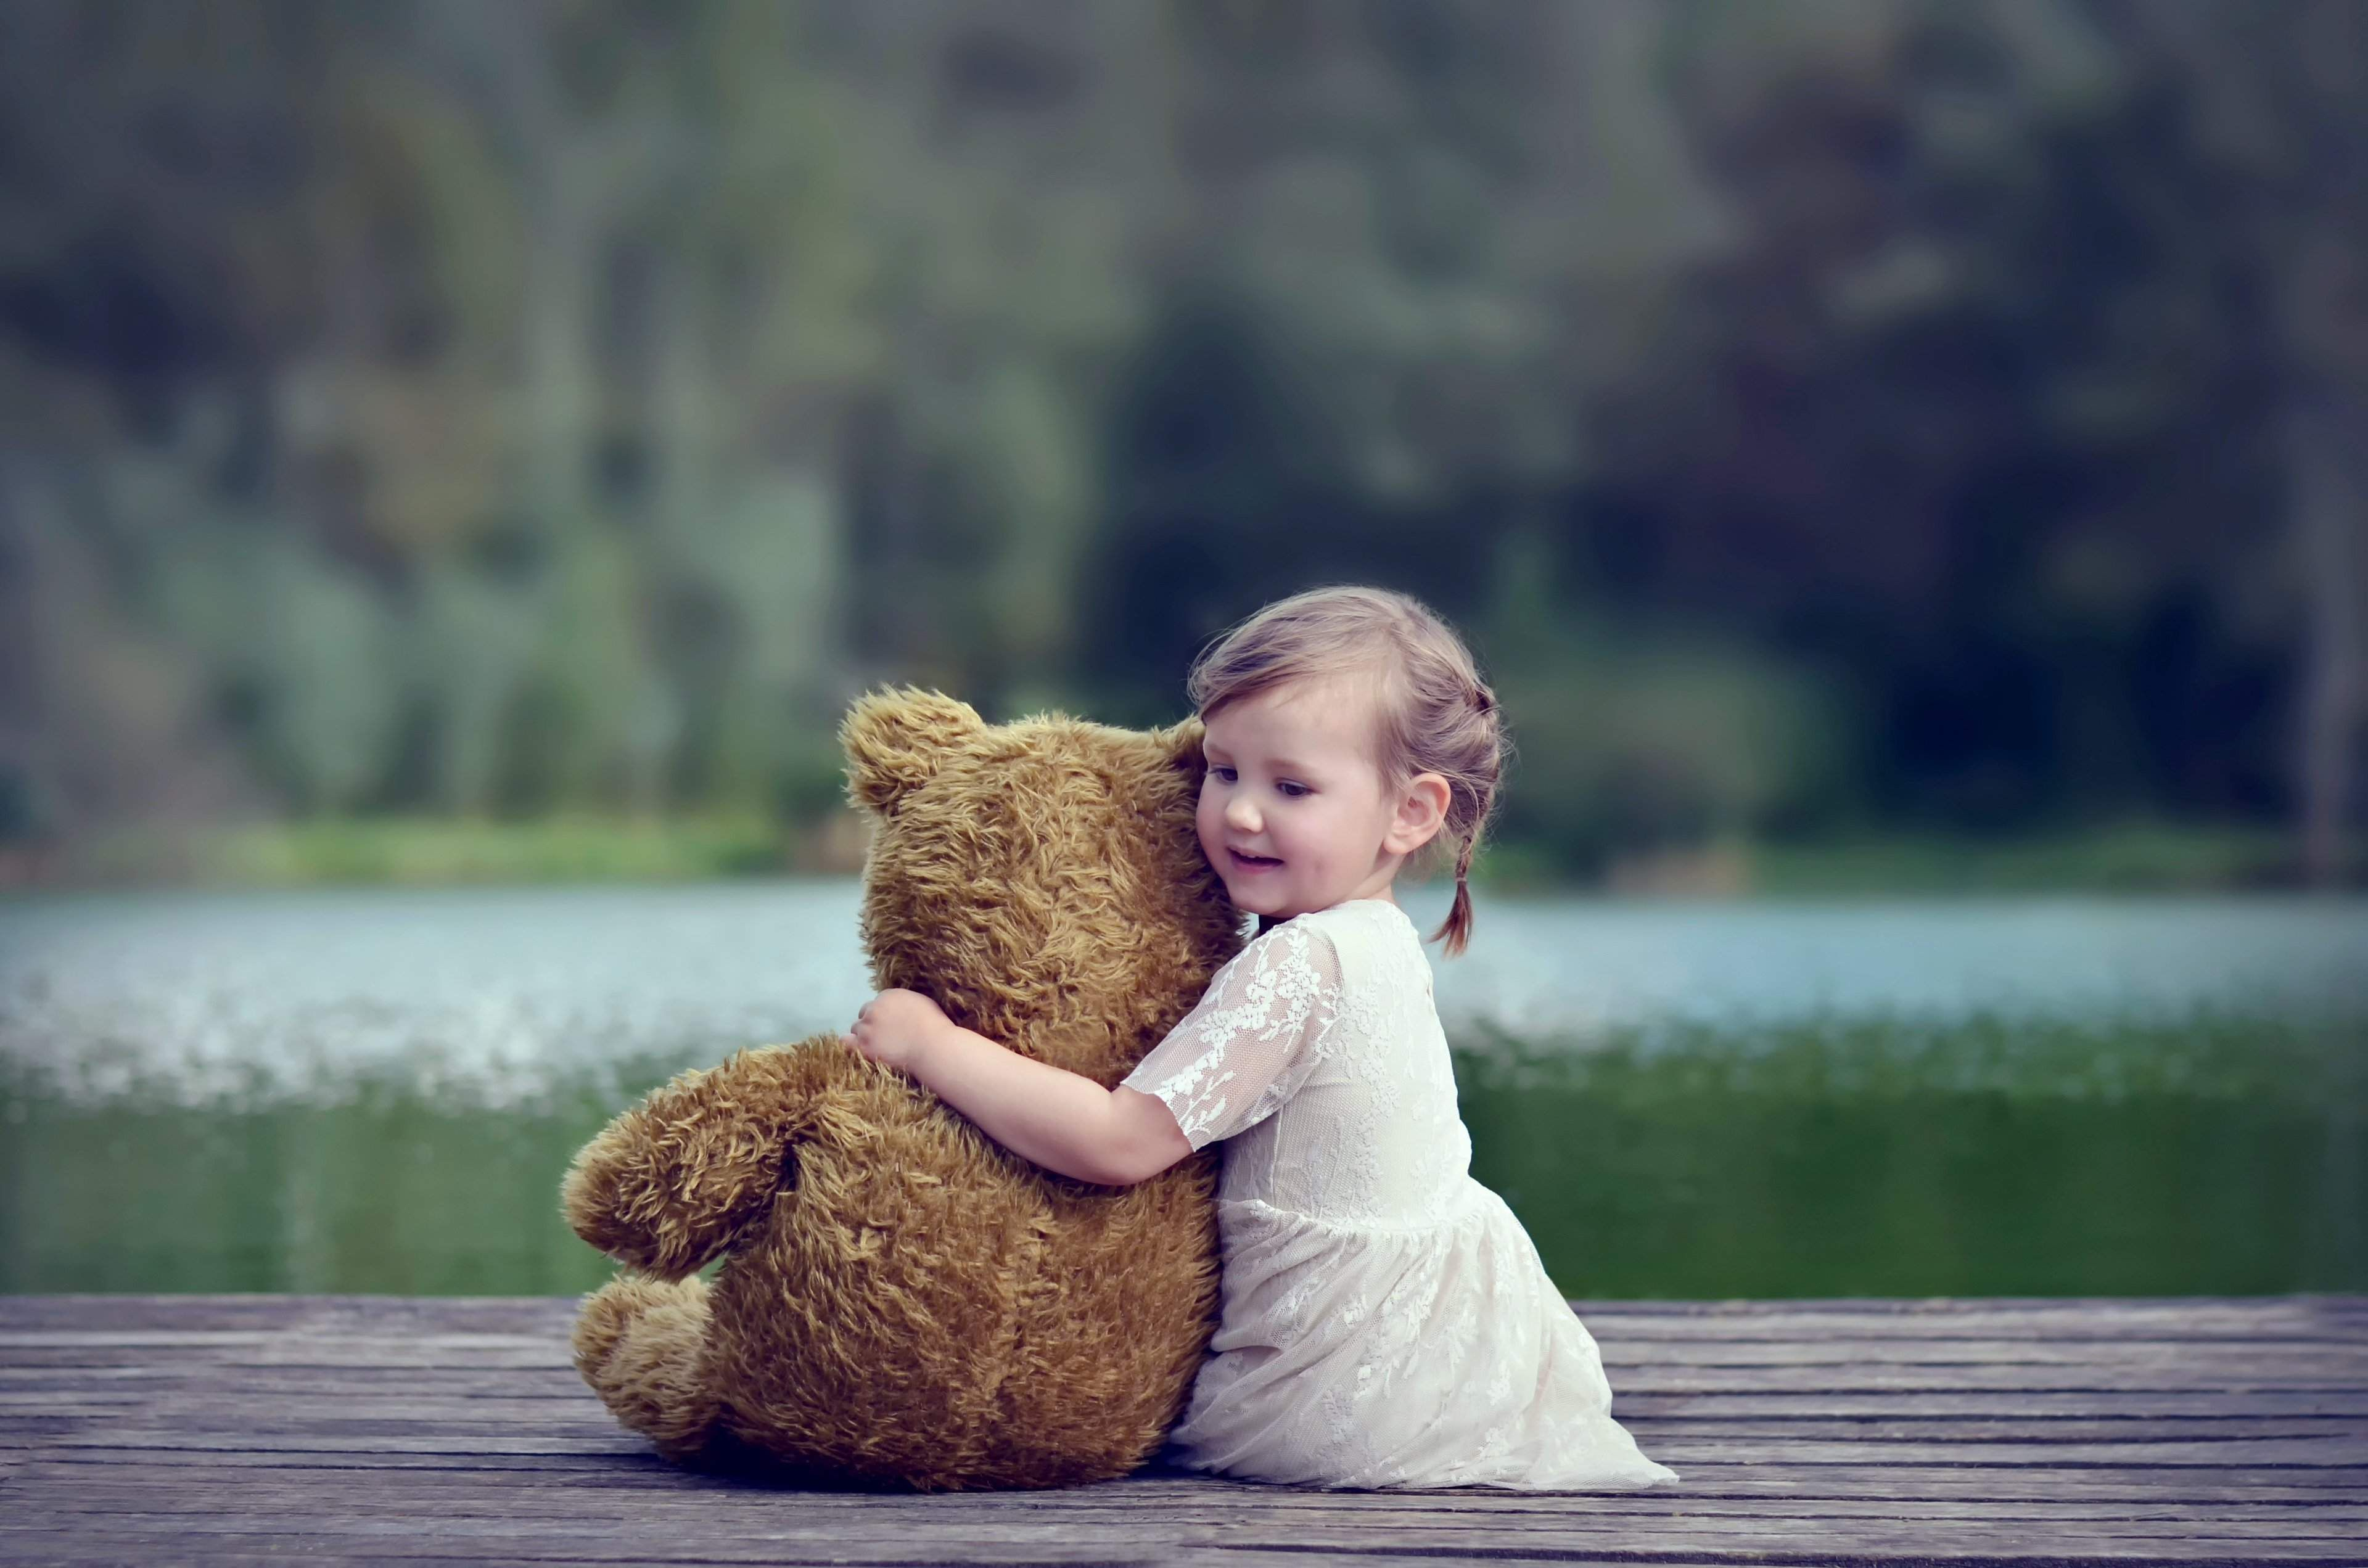 cute teddy bear wallpapers | wallpapers for desktop | pinterest